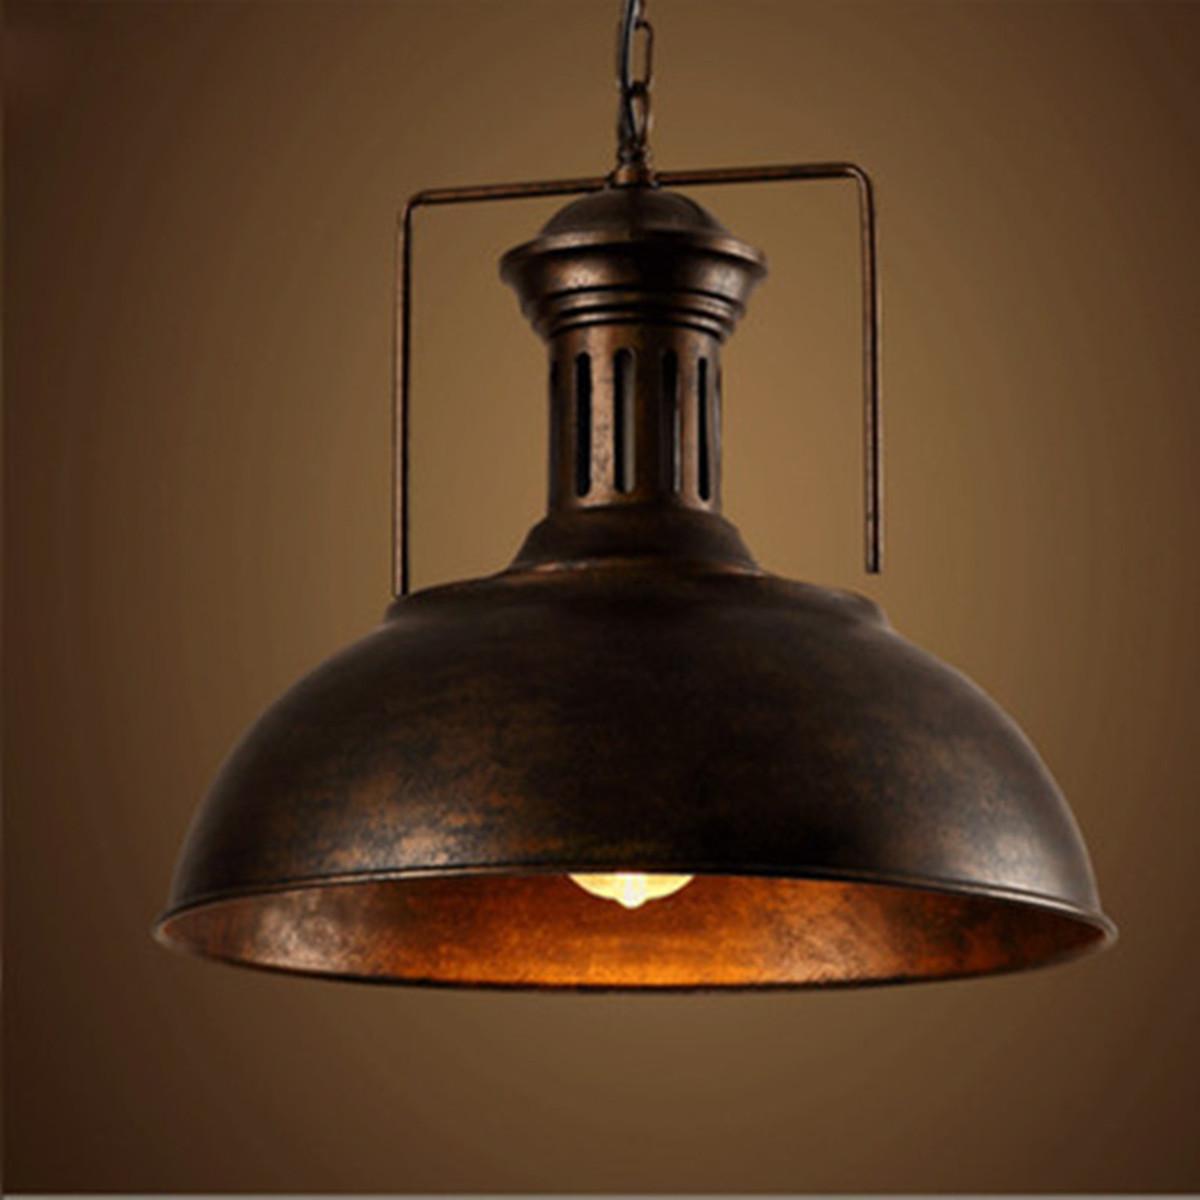 Vintage Industrial Pendant Ceiling Light Fixture Lamp Shades